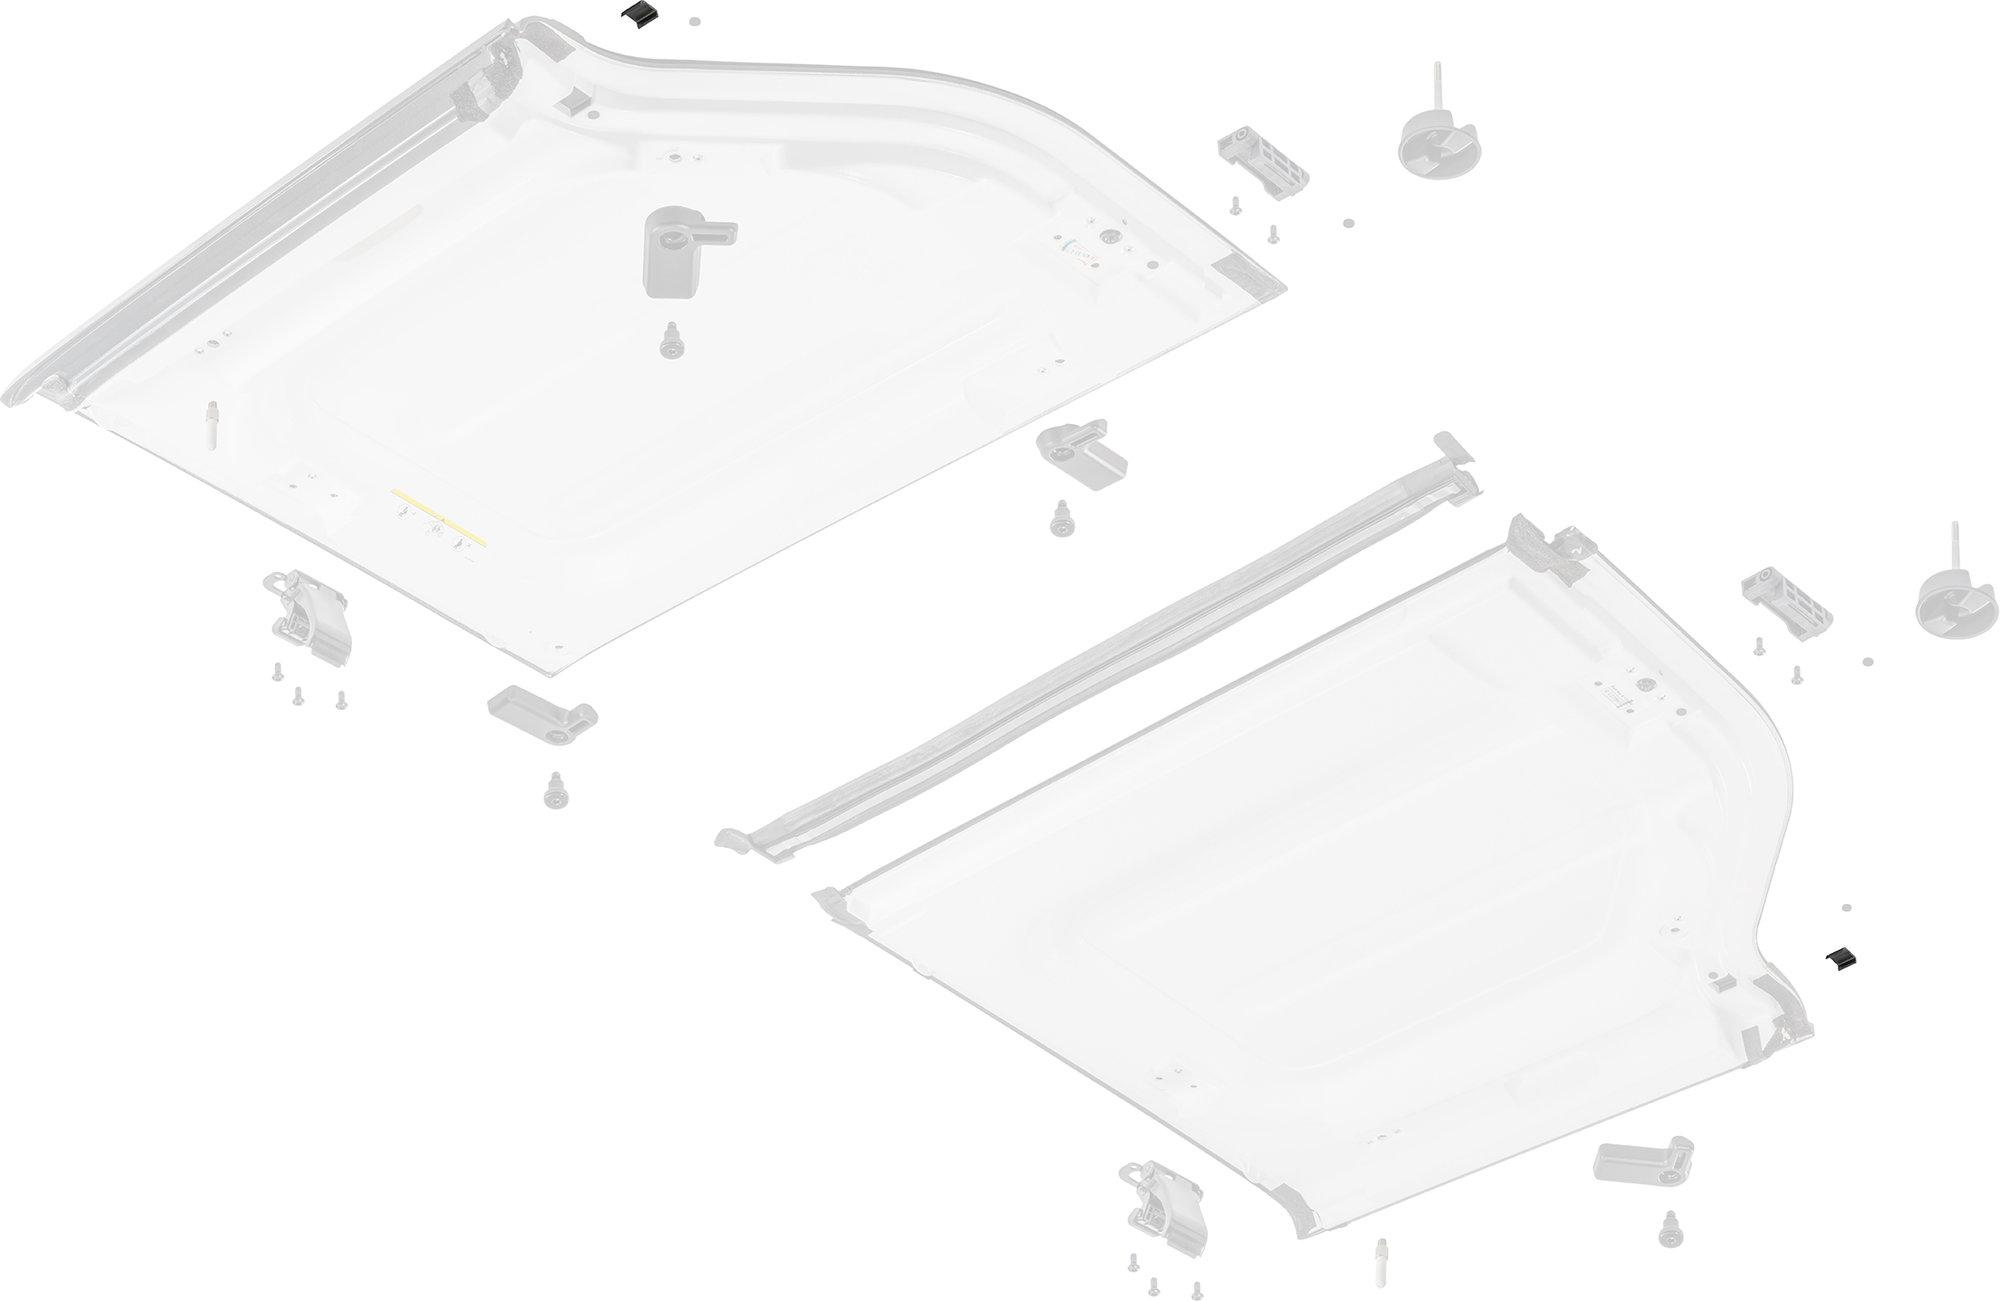 Mopar 68004991AC Hardtop Freedom Panel Isolator for 07-18